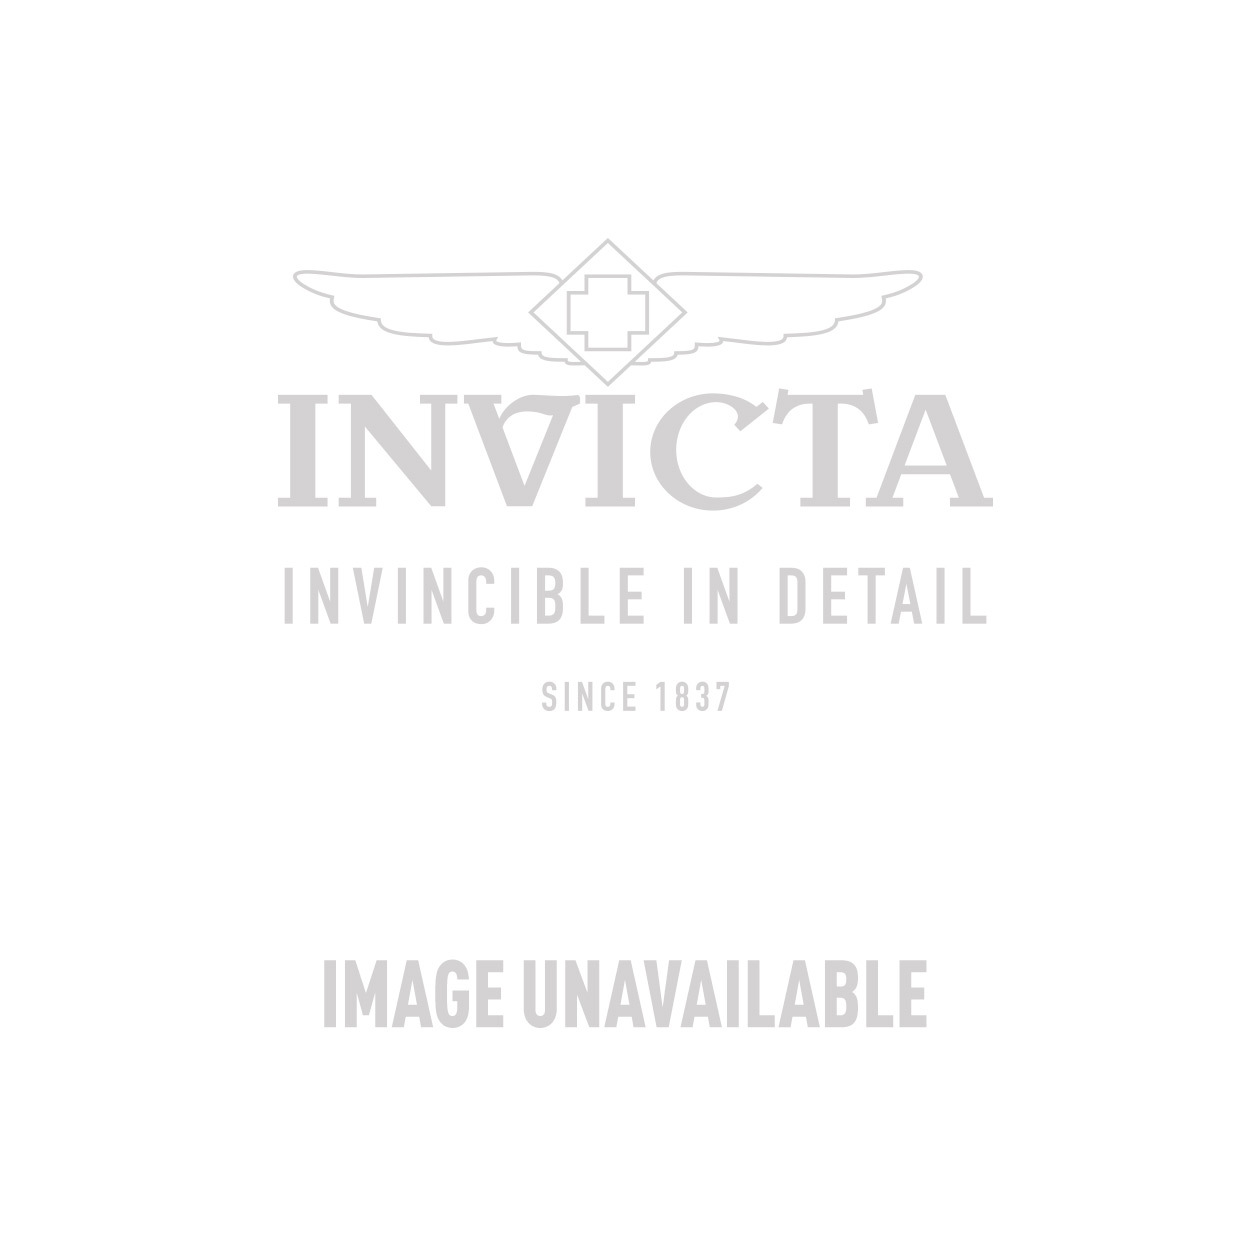 c171ea8d1 Invicta Speedway SCUBA Mens Quartz 50mm Stainless Steel Case Blue Dial -  Model 25947 - Official Invicta Store